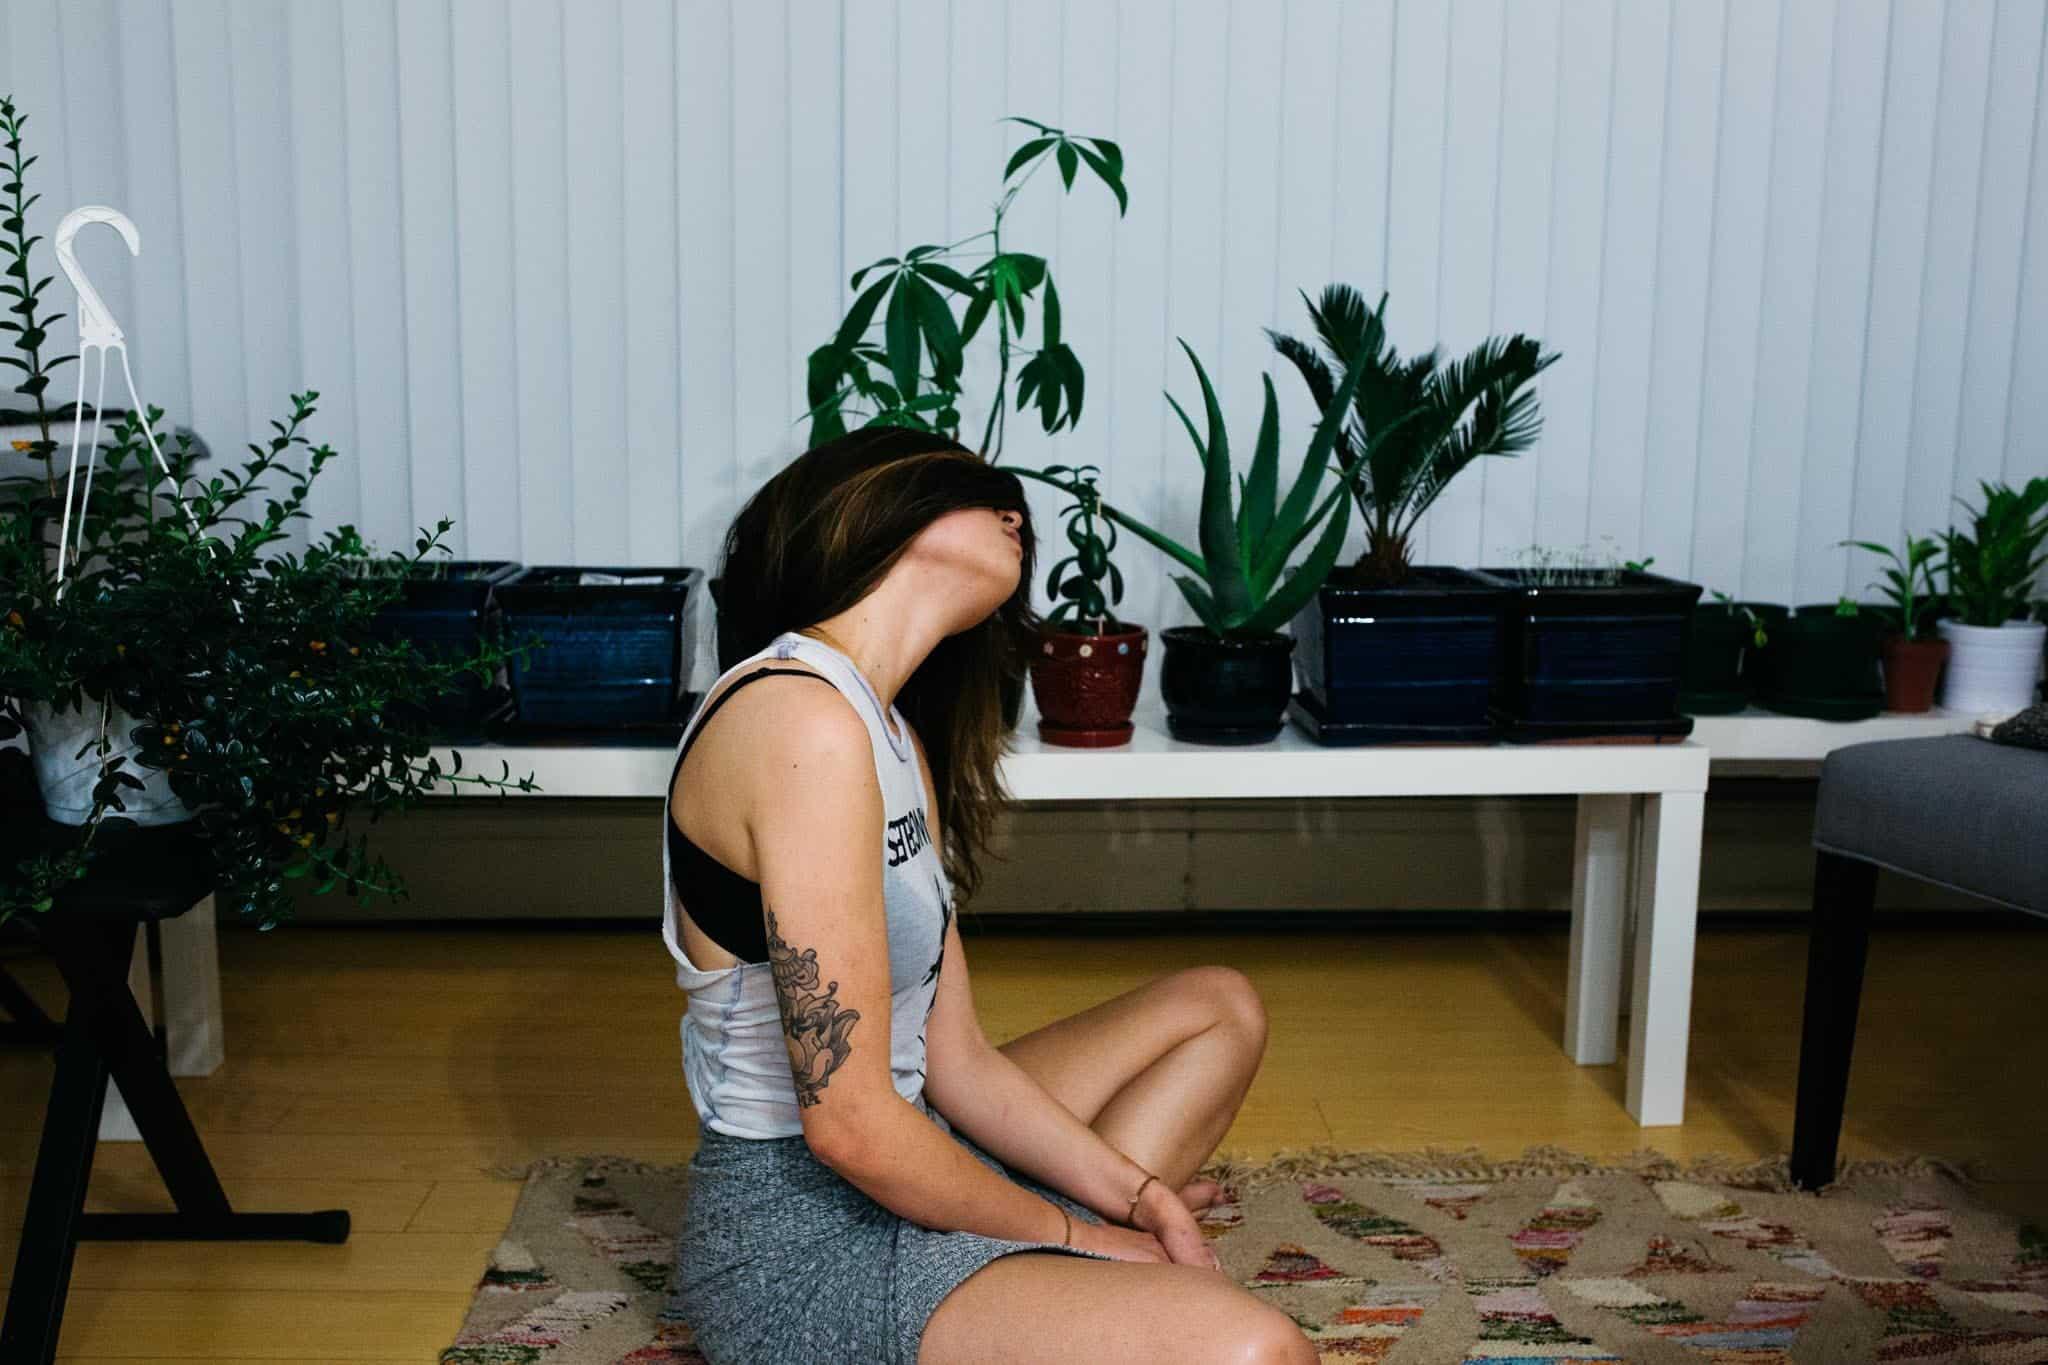 Lena Bell / Unsplash